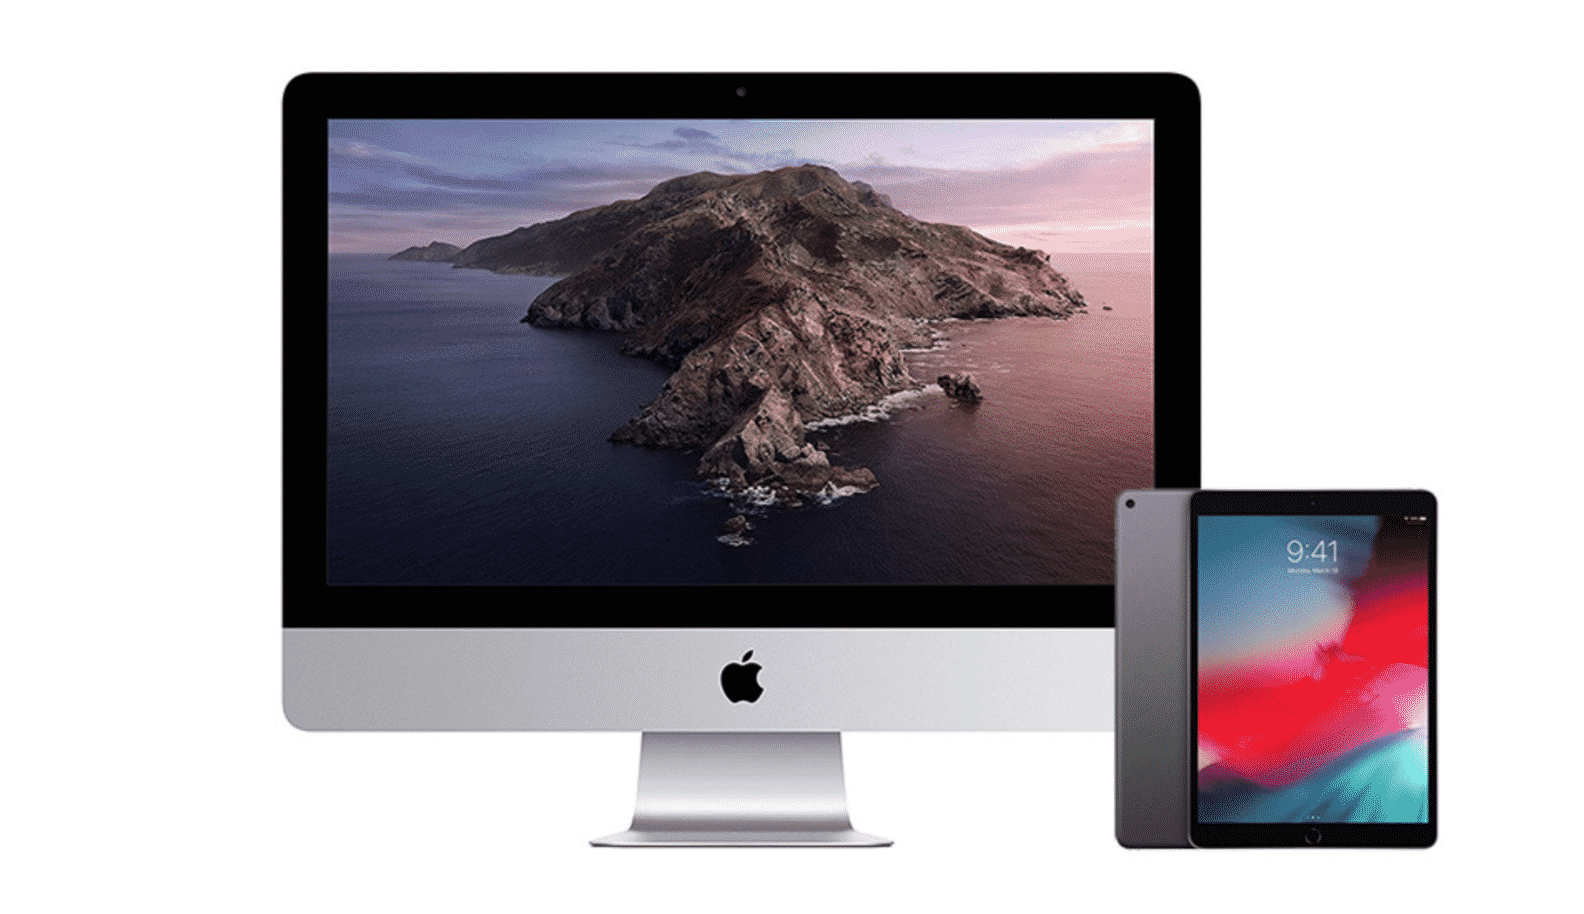 iMac, an iPad Air and an iPad Mini